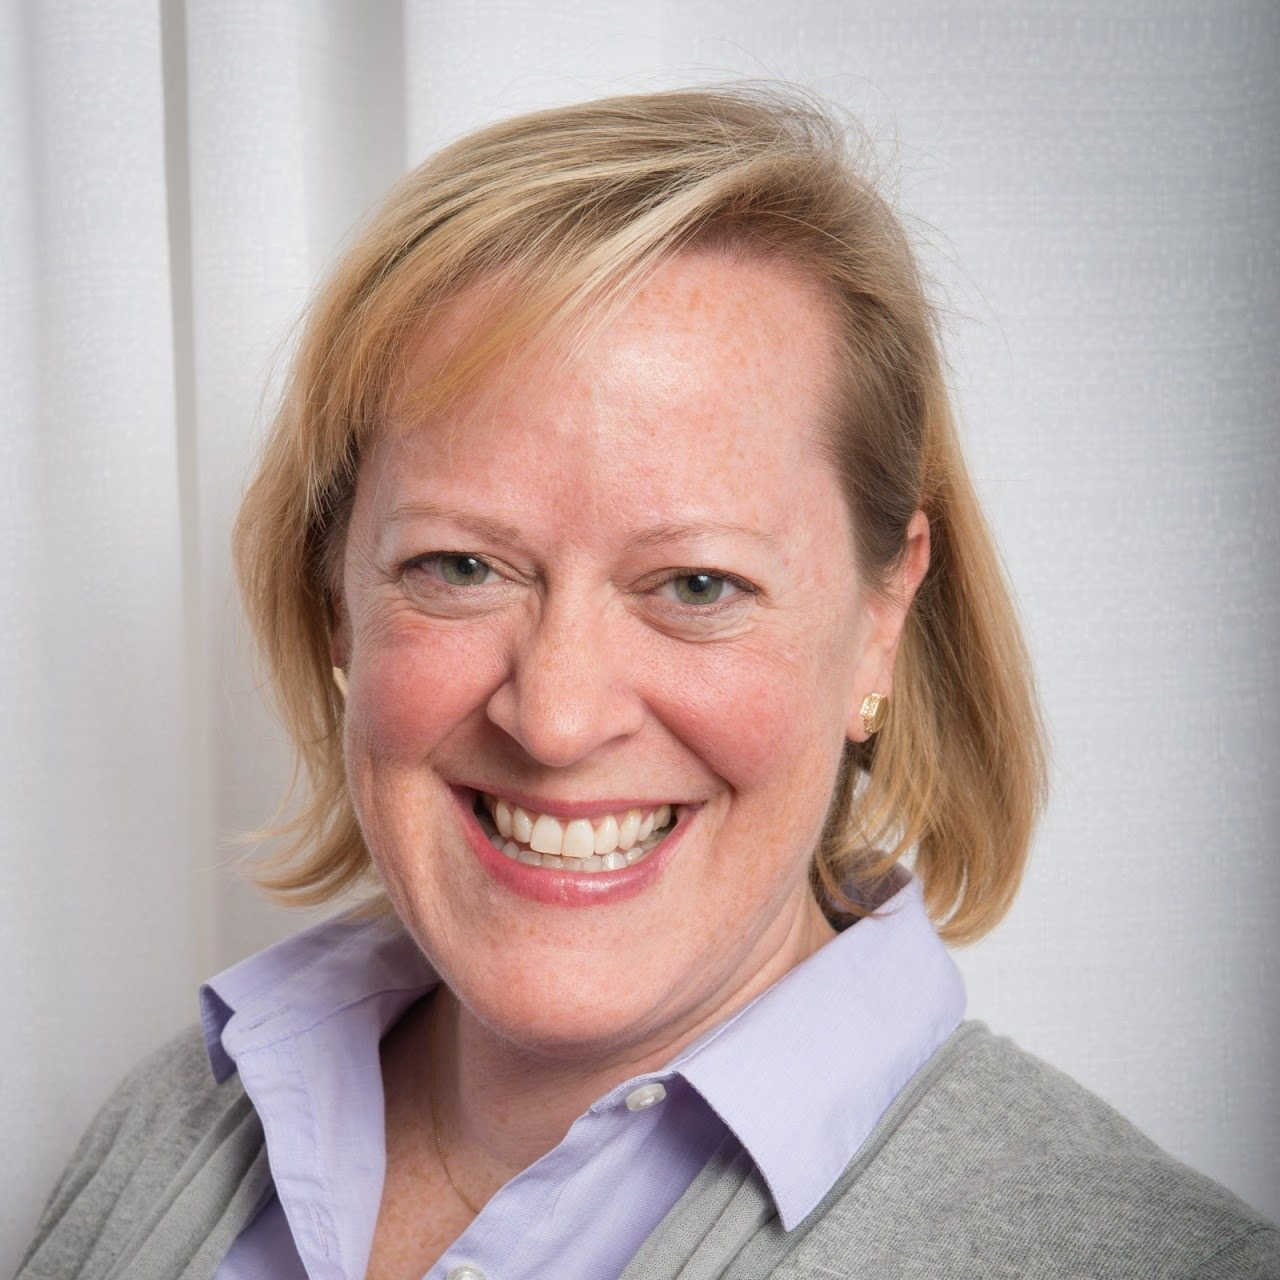 Jennifer Peterson - restaurant marketing